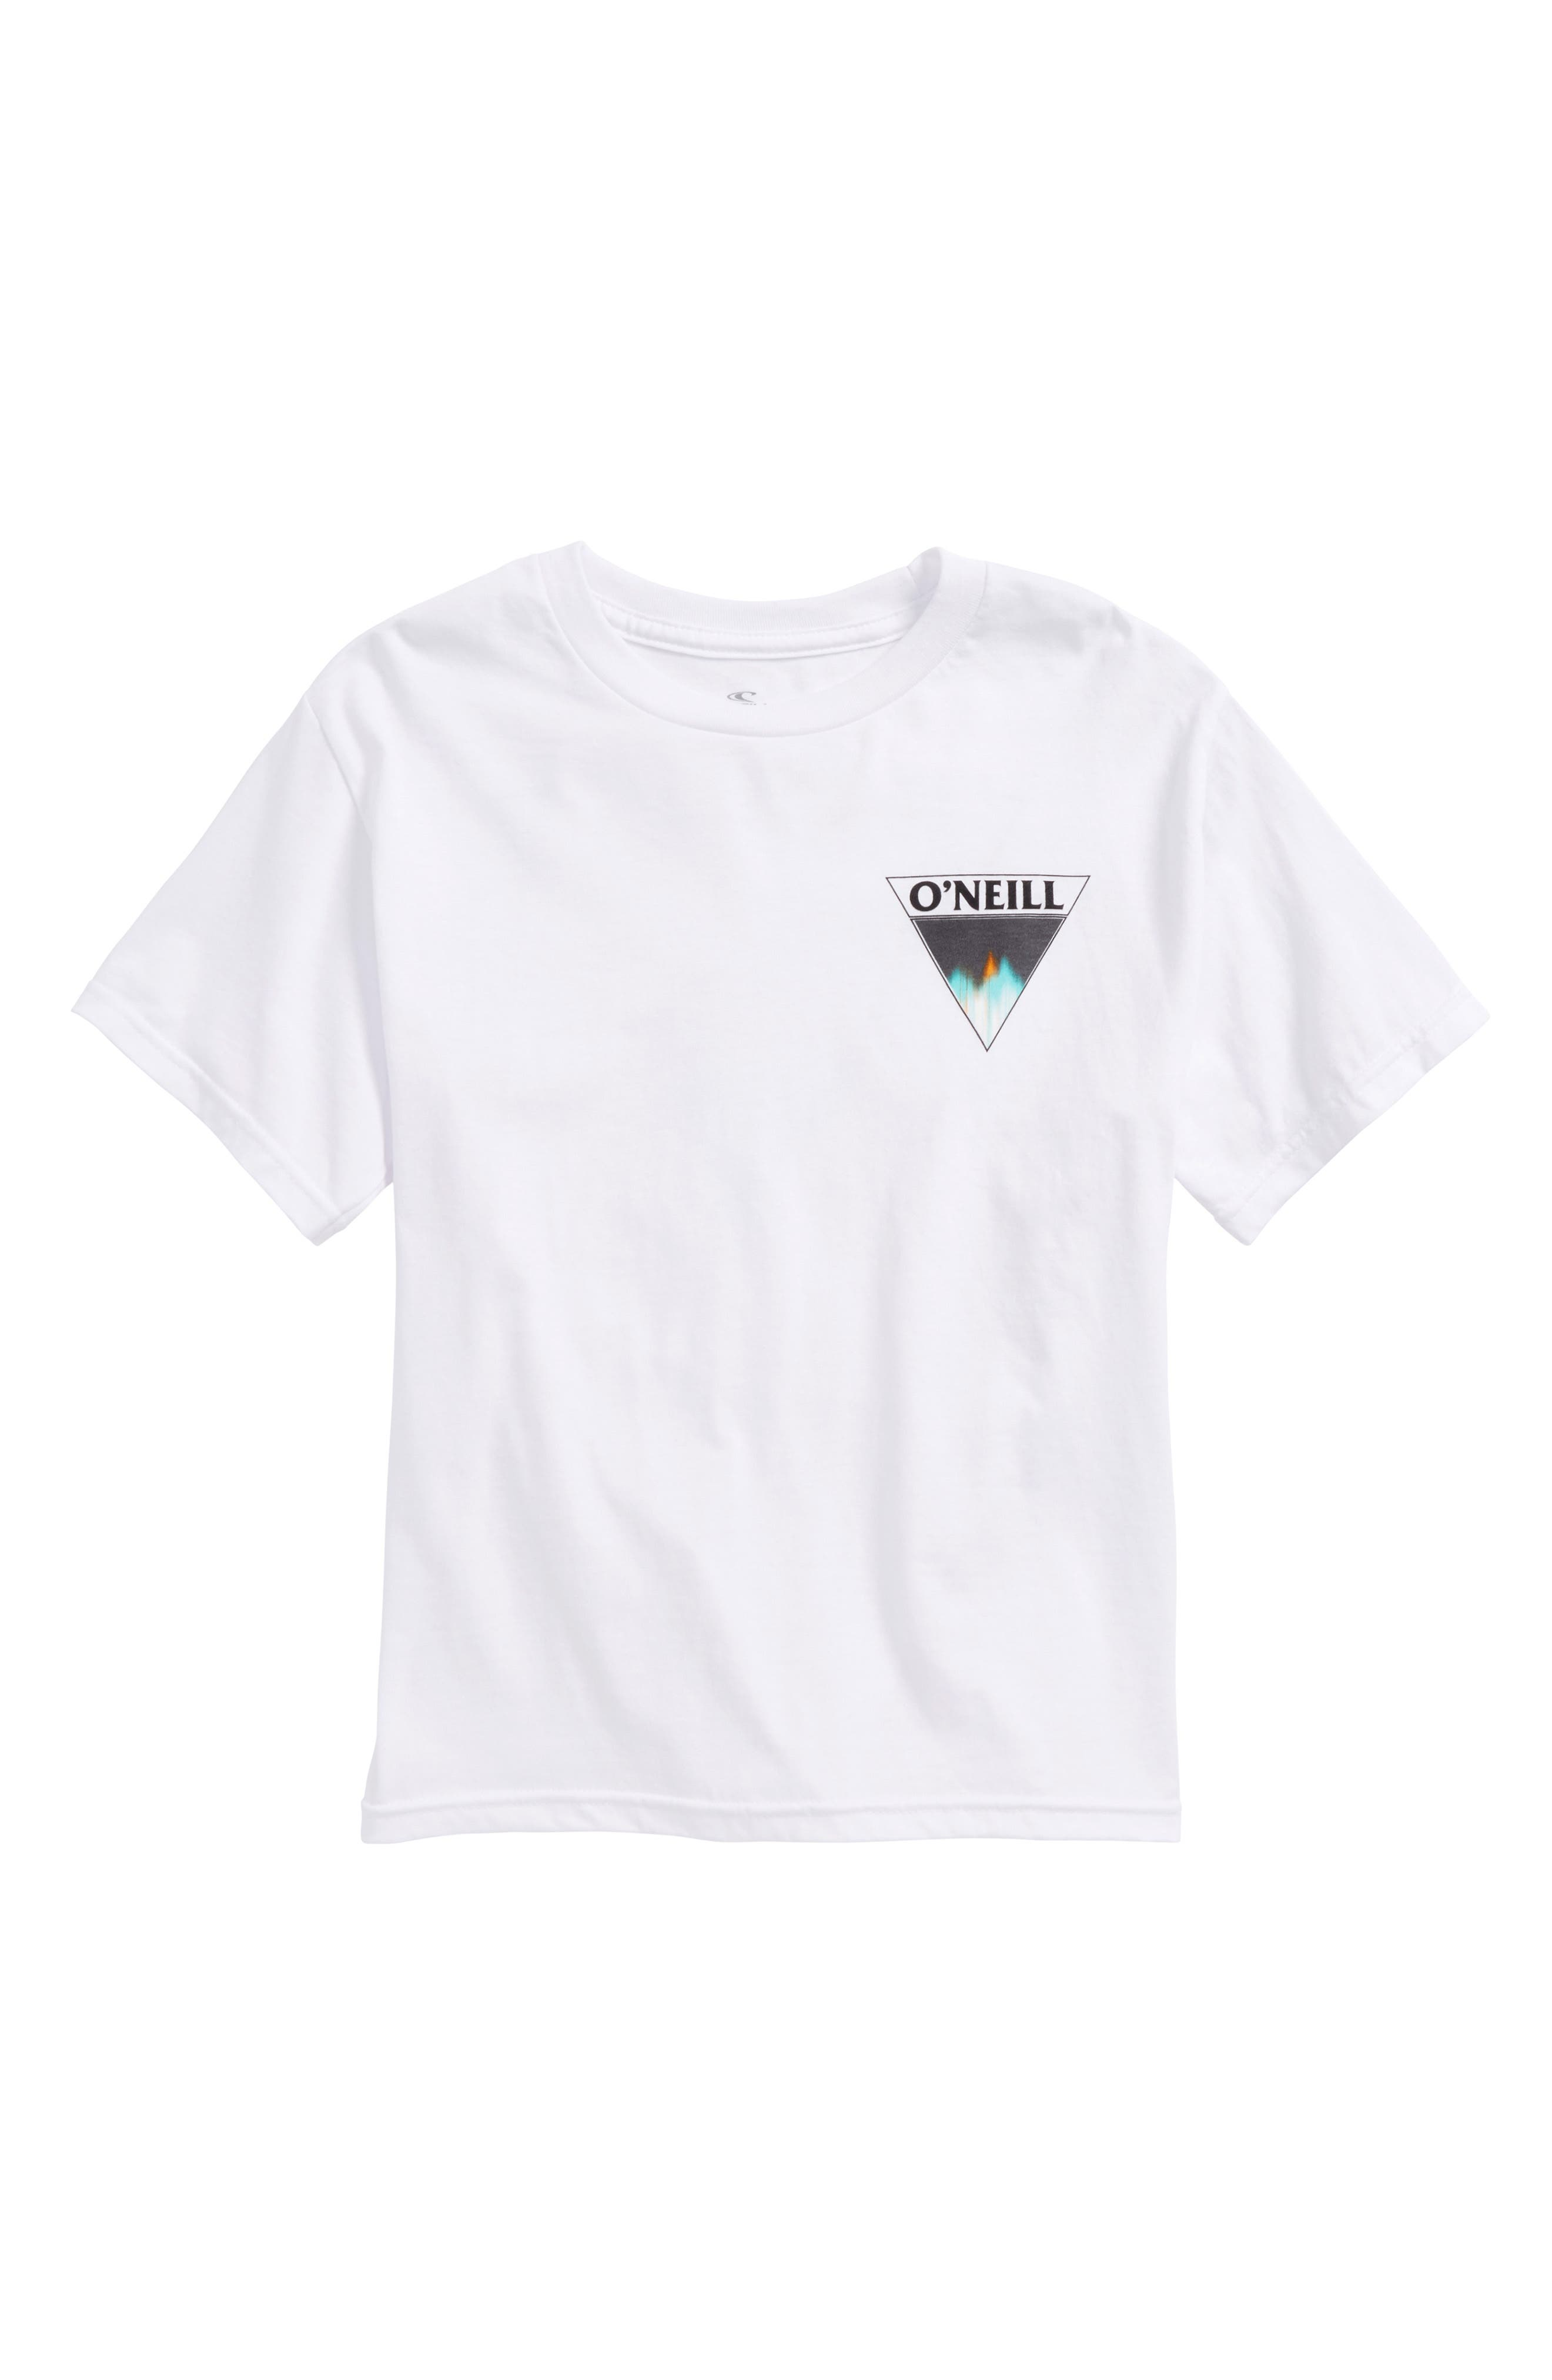 Streaker Graphic T-Shirt,                         Main,                         color, White